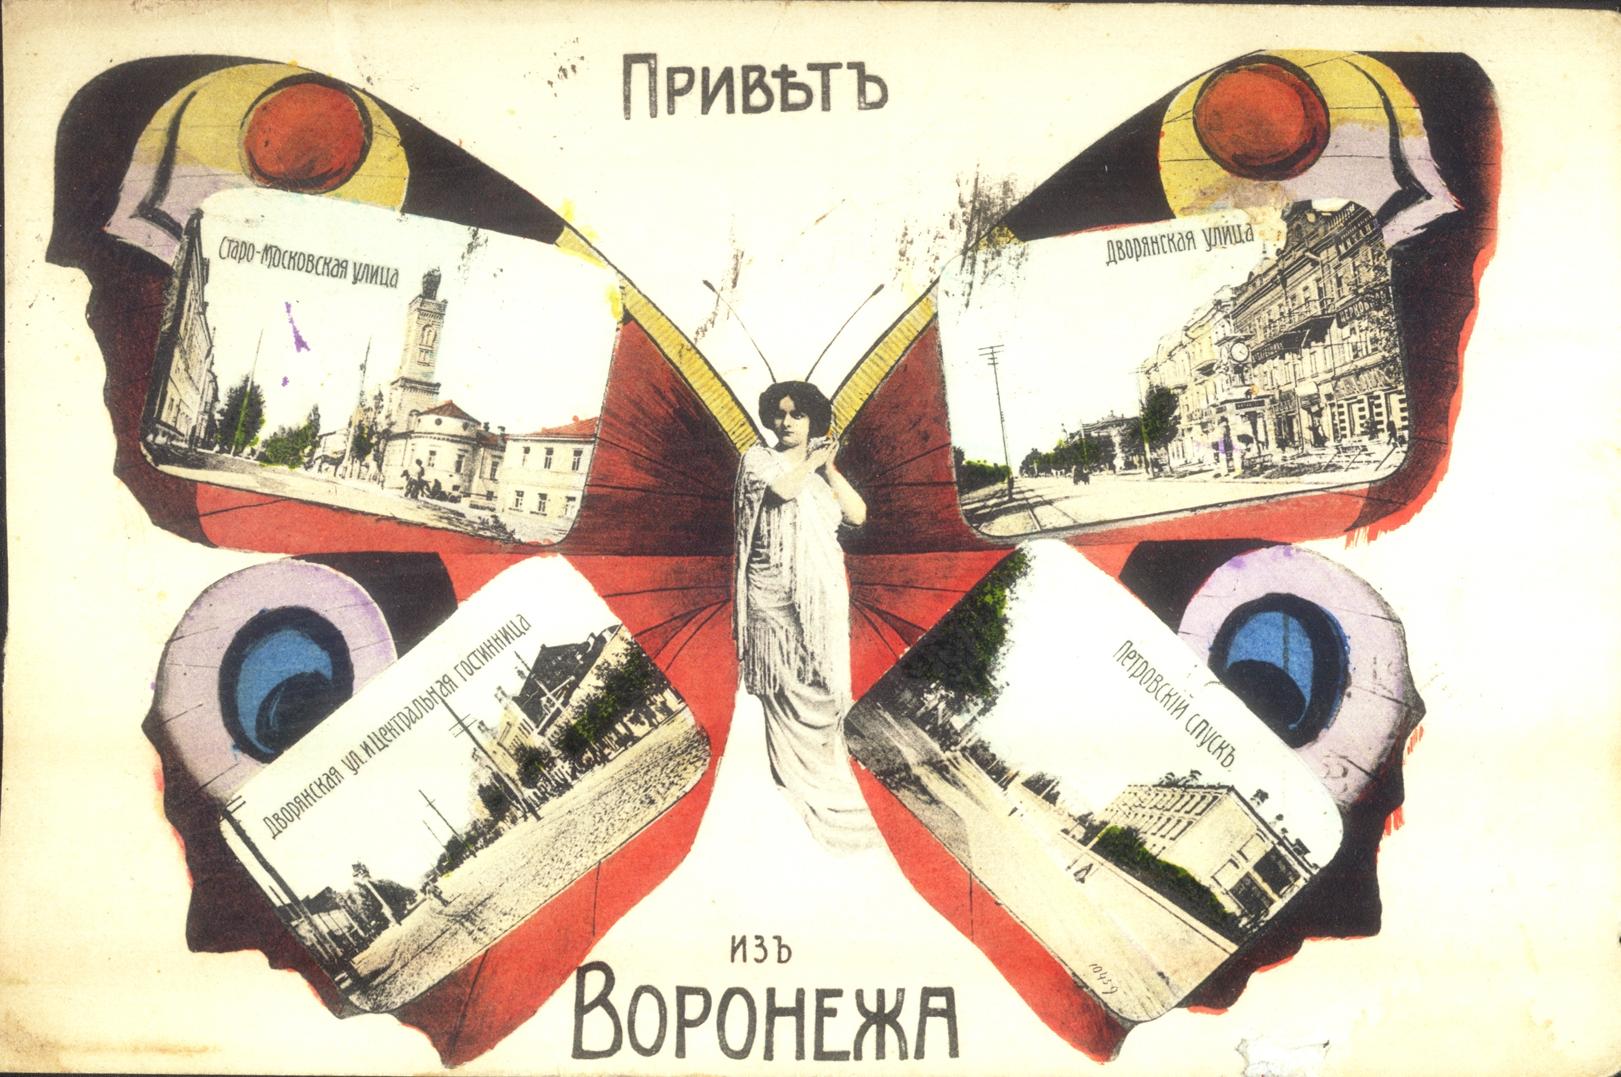 http://s1.uploads.ru/Kd2Oq.jpg